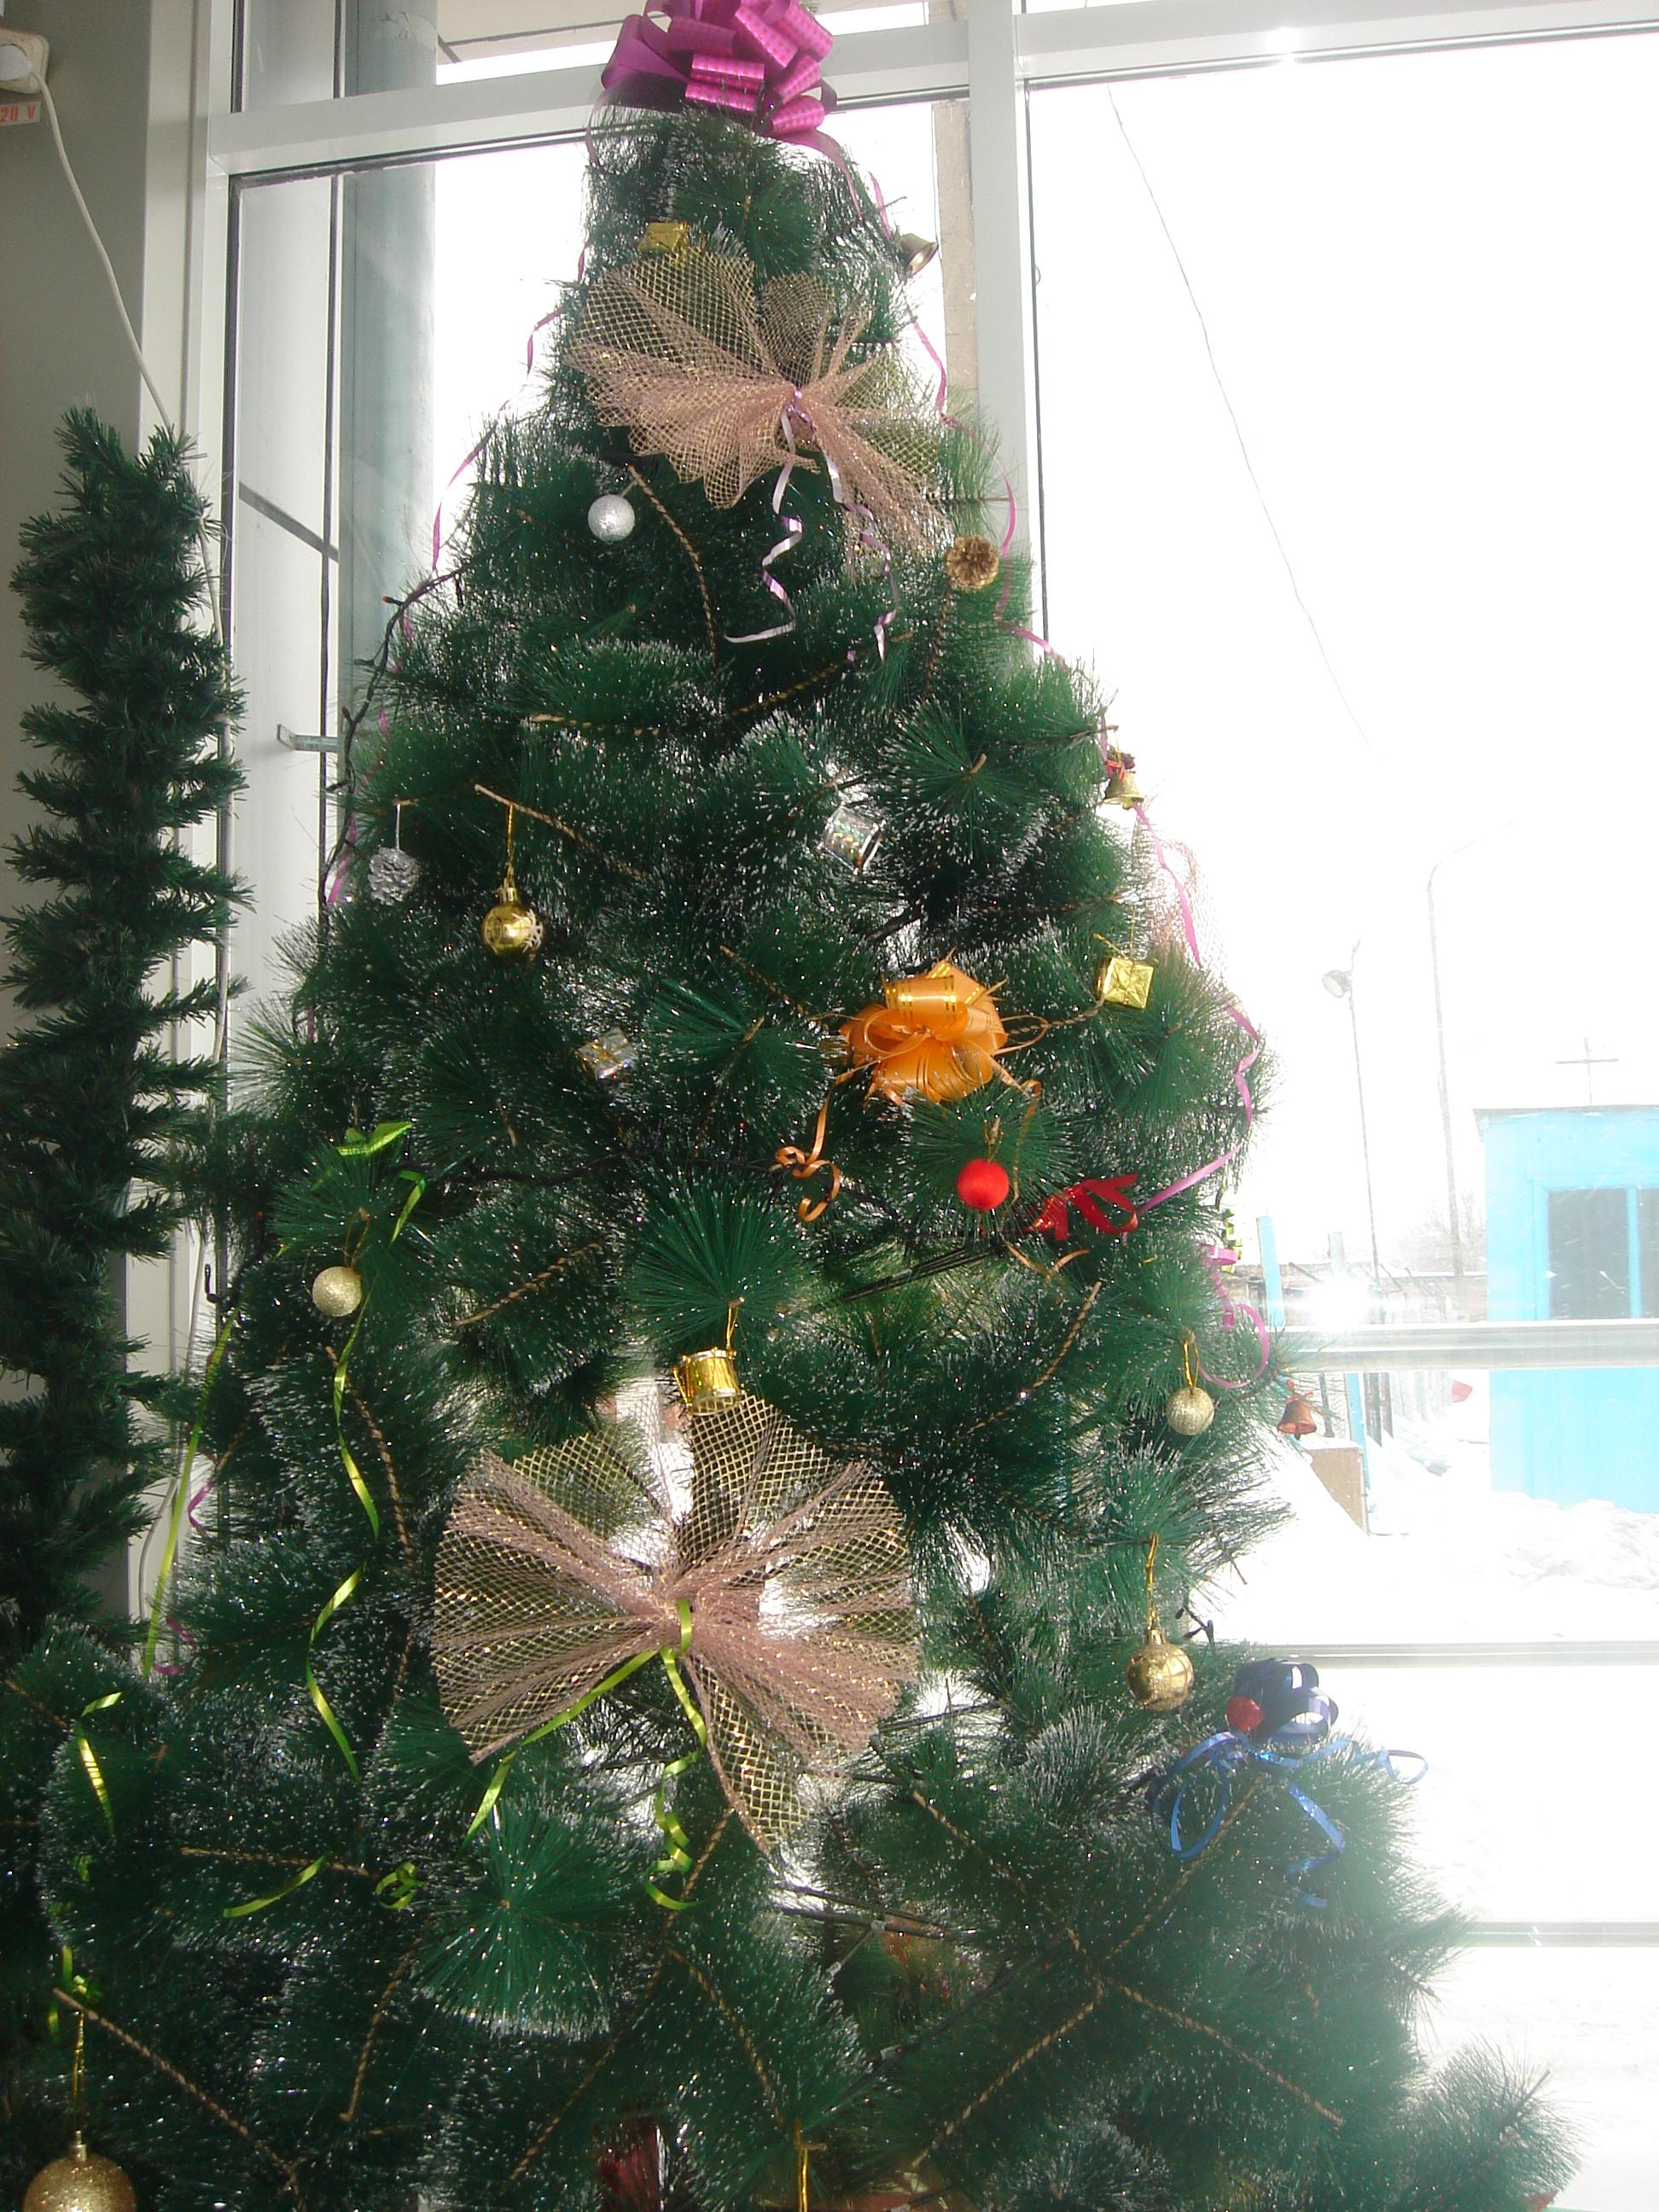 New years fir tree, Black, Shiny, Nature, Night, HQ Photo